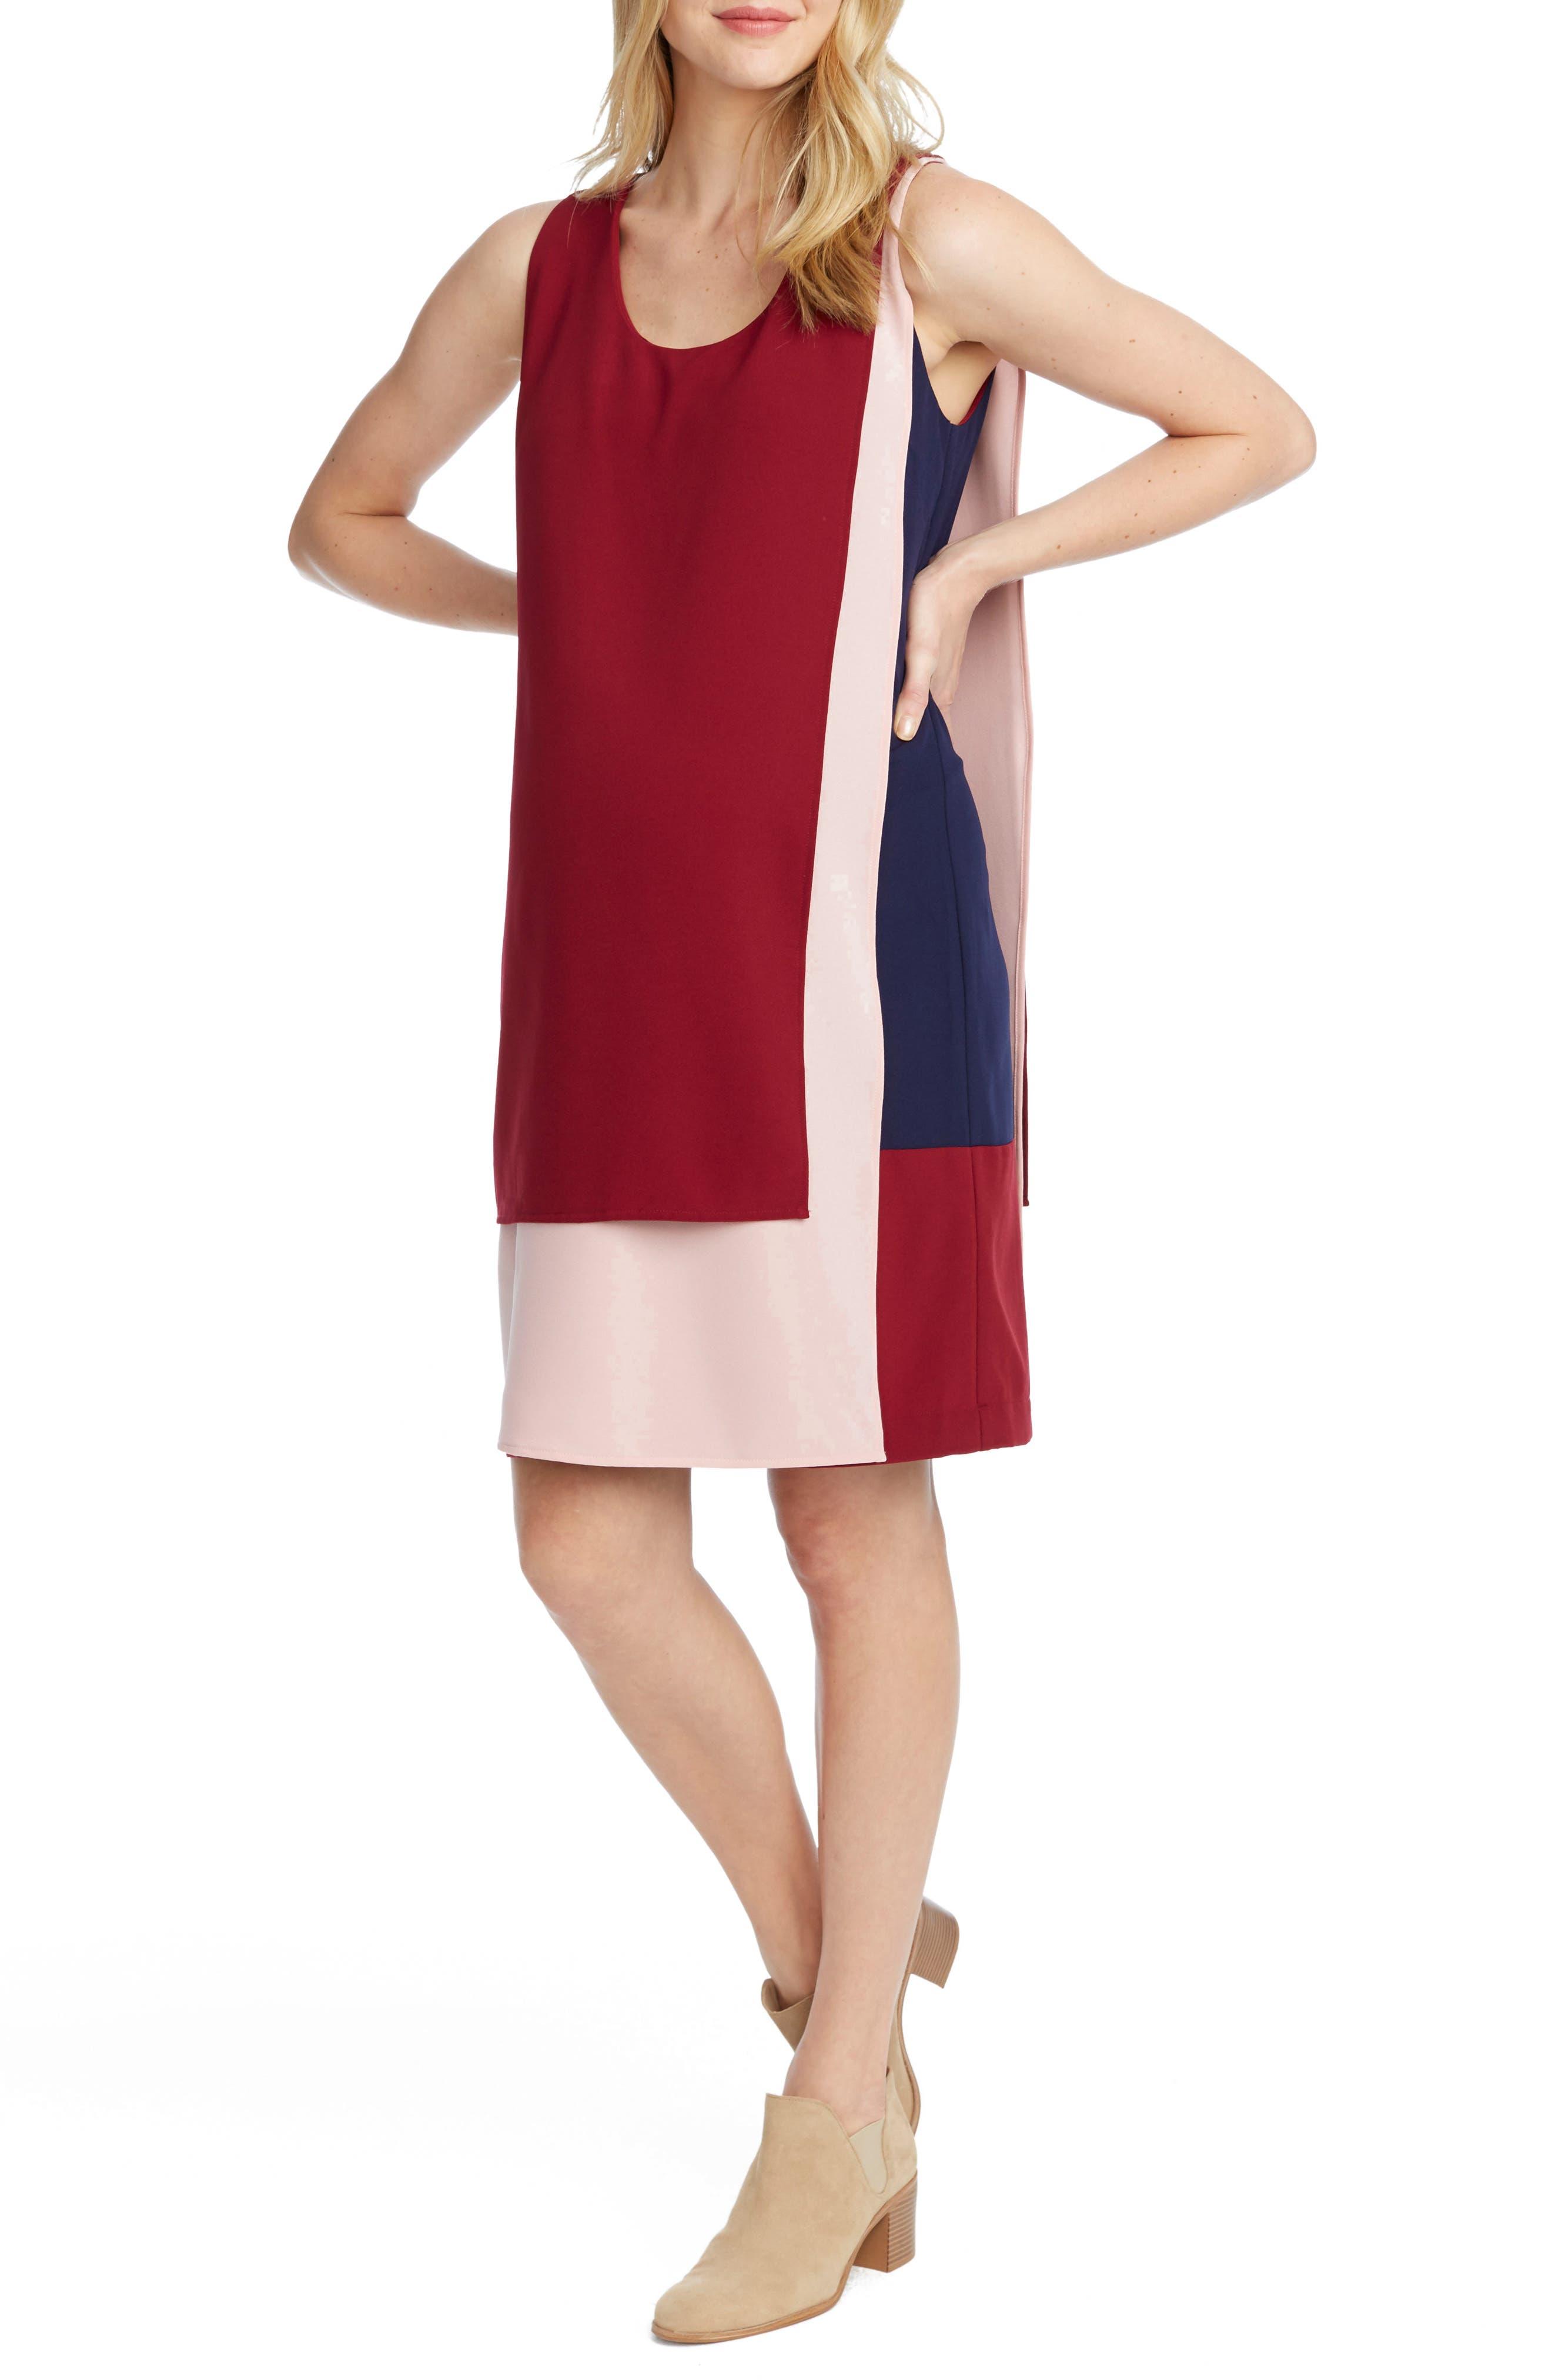 Edina Maternity Shift Dress,                         Main,                         color, Deep Ruby/ Blush/ Navy